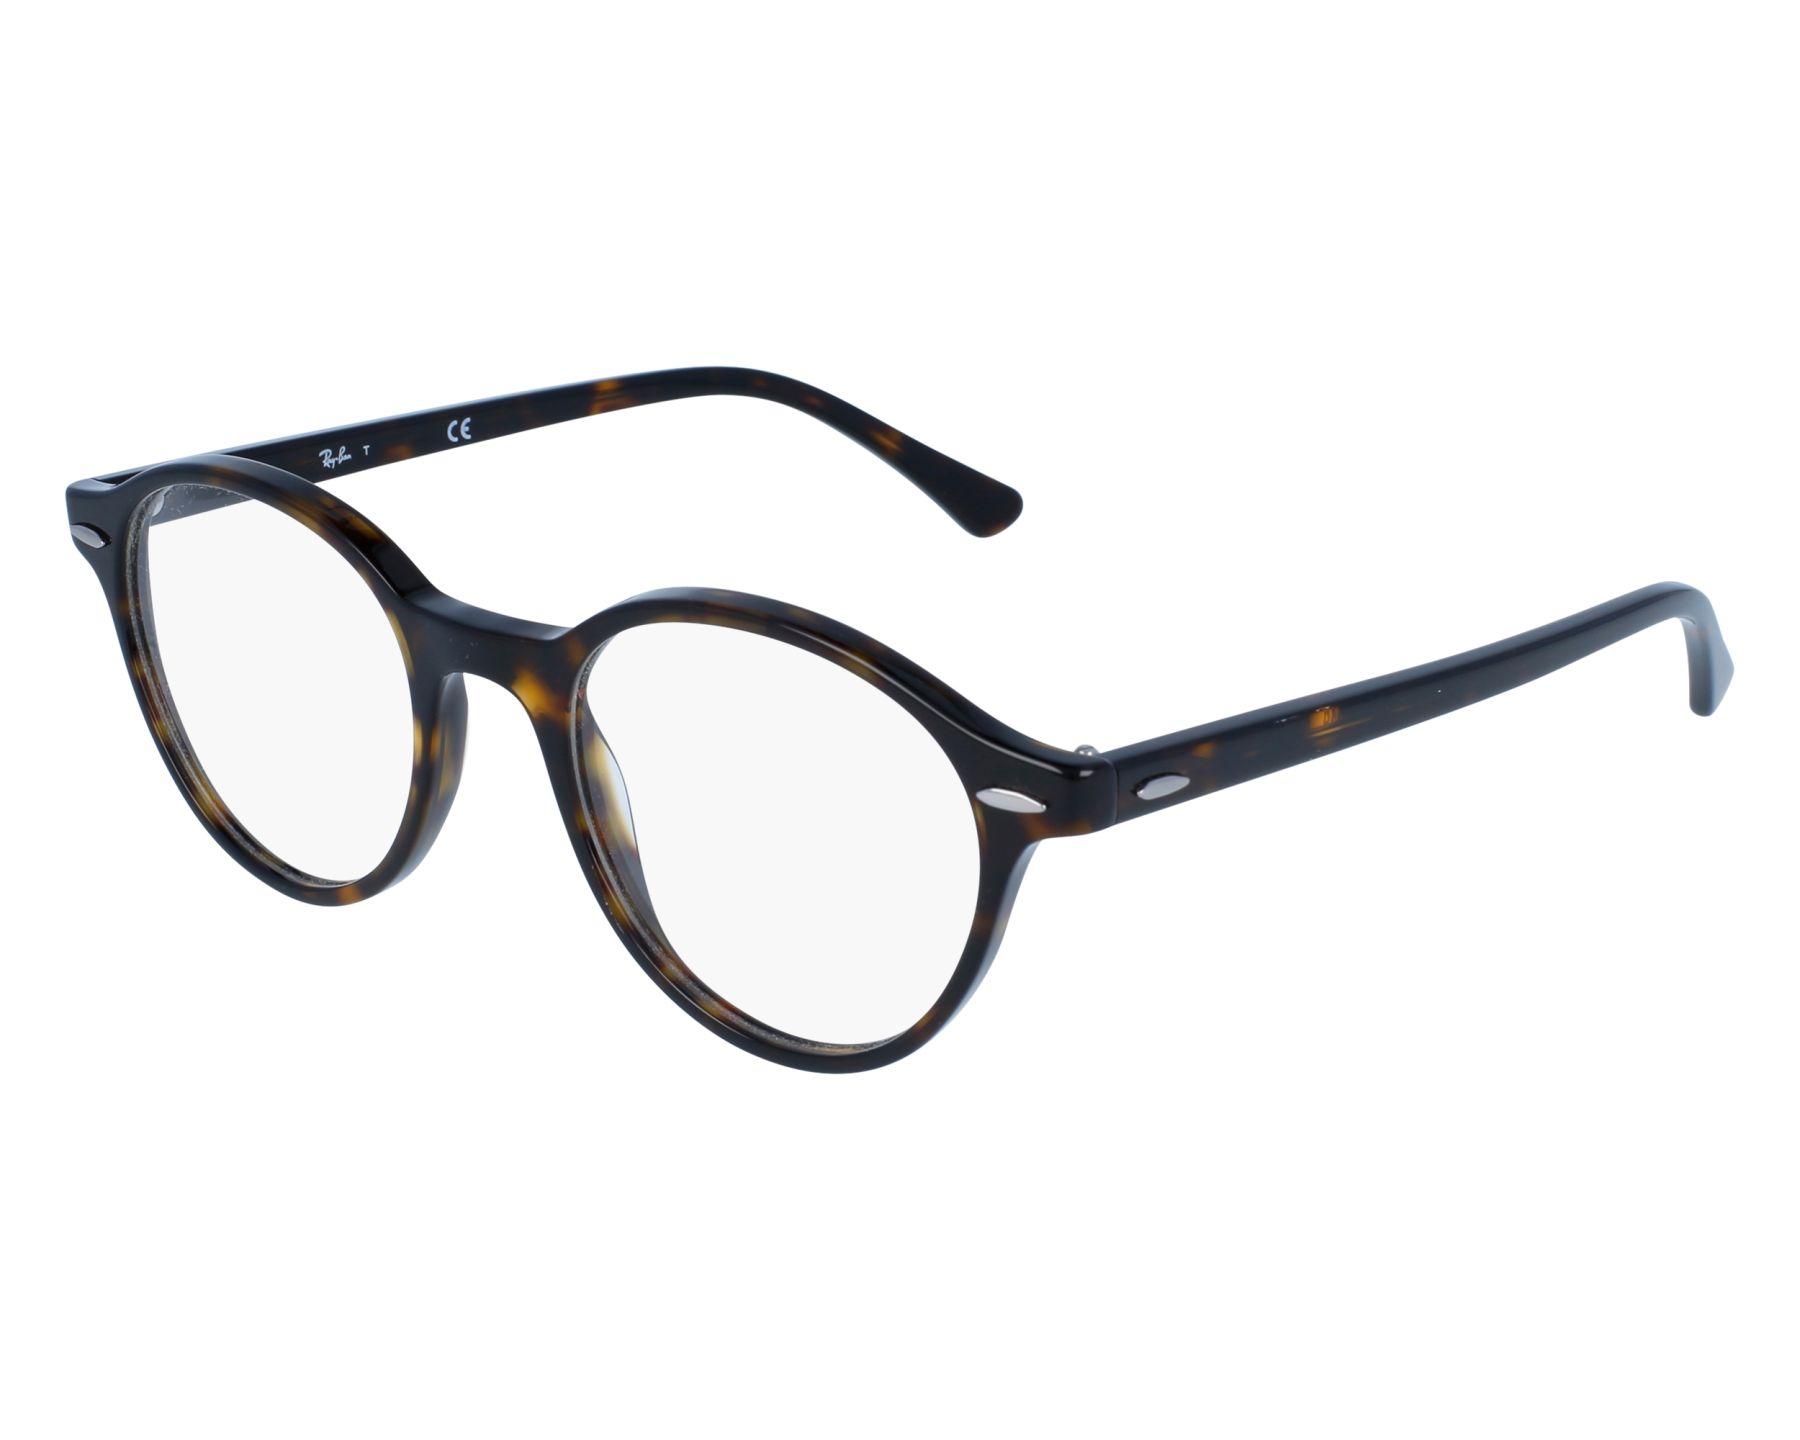 7a3c623fa3e eyeglasses Ray-Ban RX-7118 2012 48-19 Havana front view